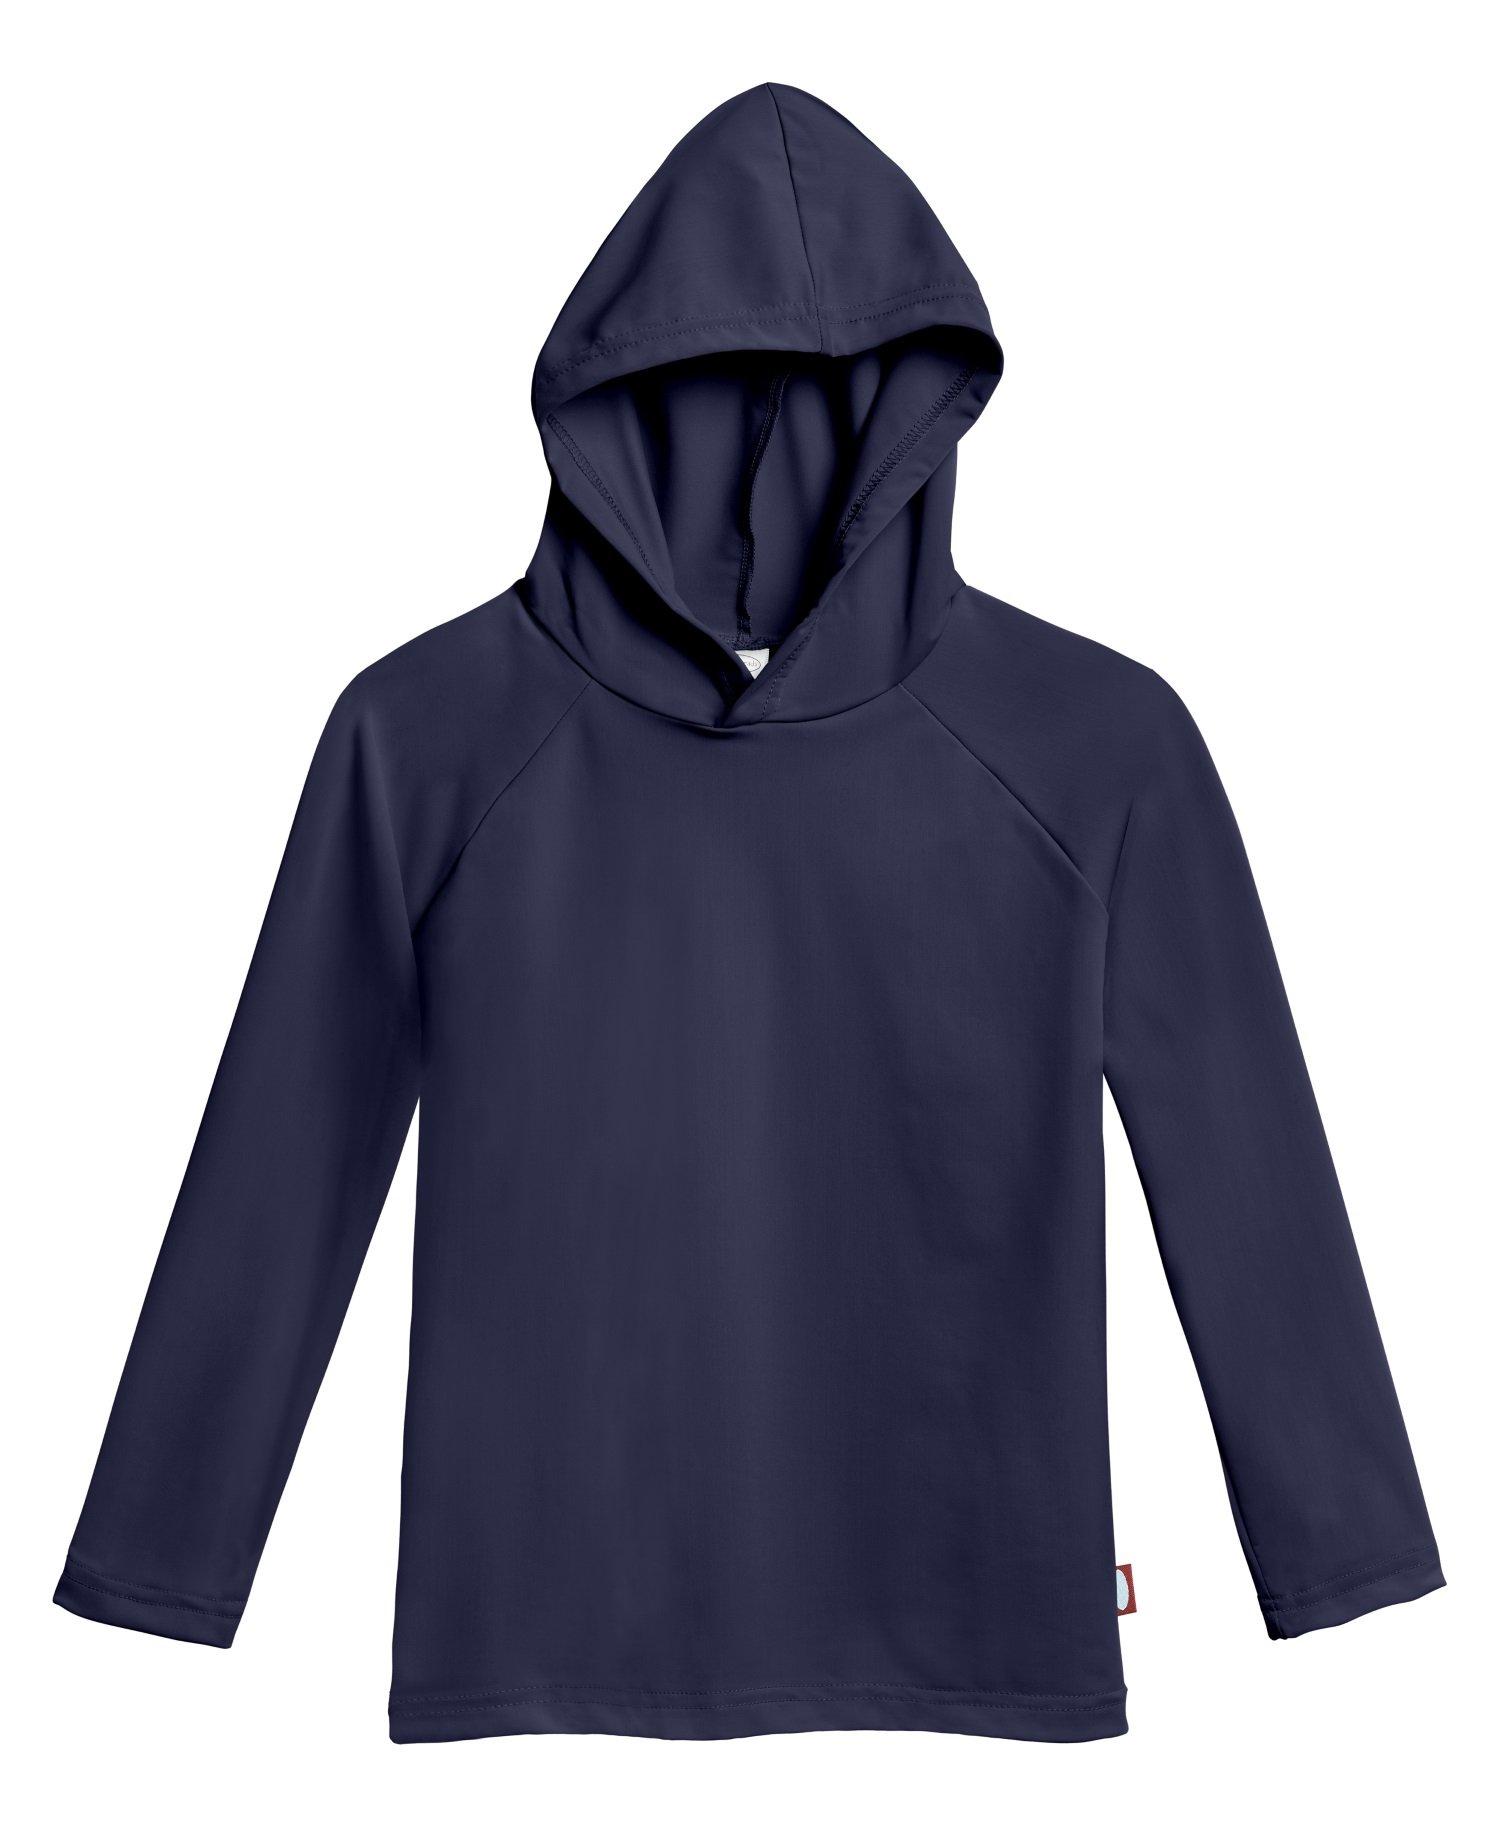 City Threads Baby Boys' and Girls' Hooded Long Sleeve Rashguard For Sun Protection Beach Pool Swimming Tee, Navy, 18/24m